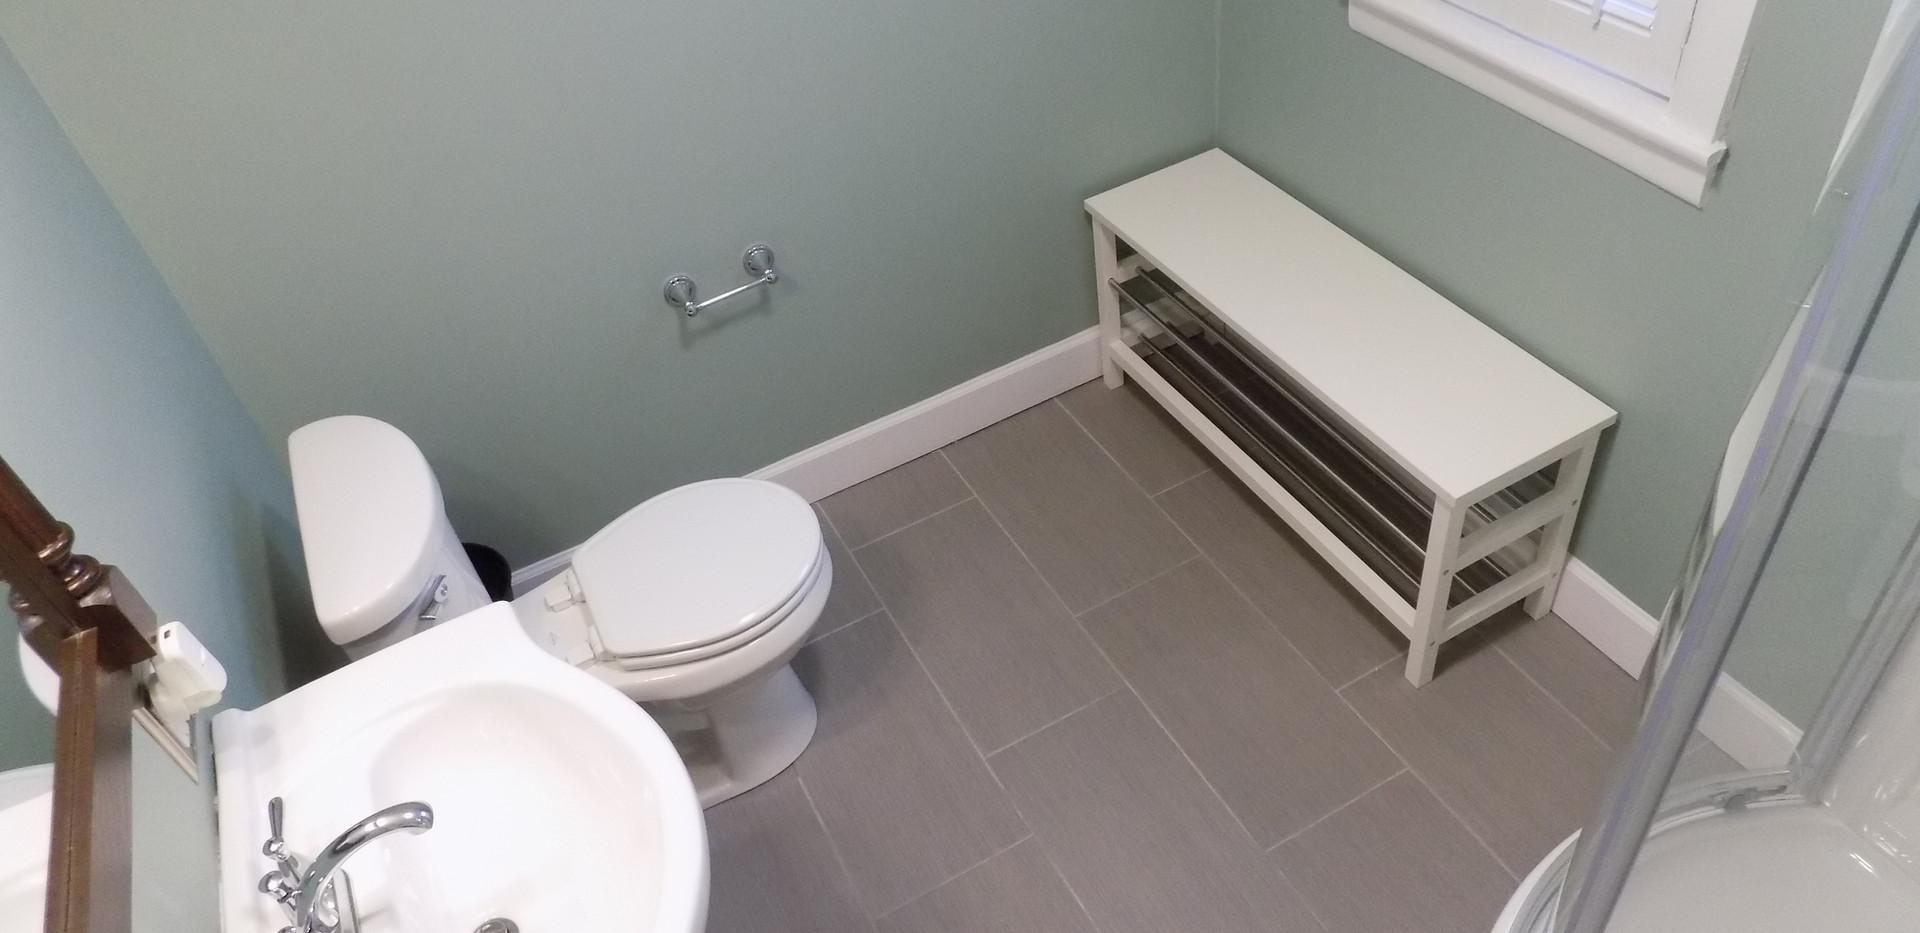 Bathroom B birdseye view